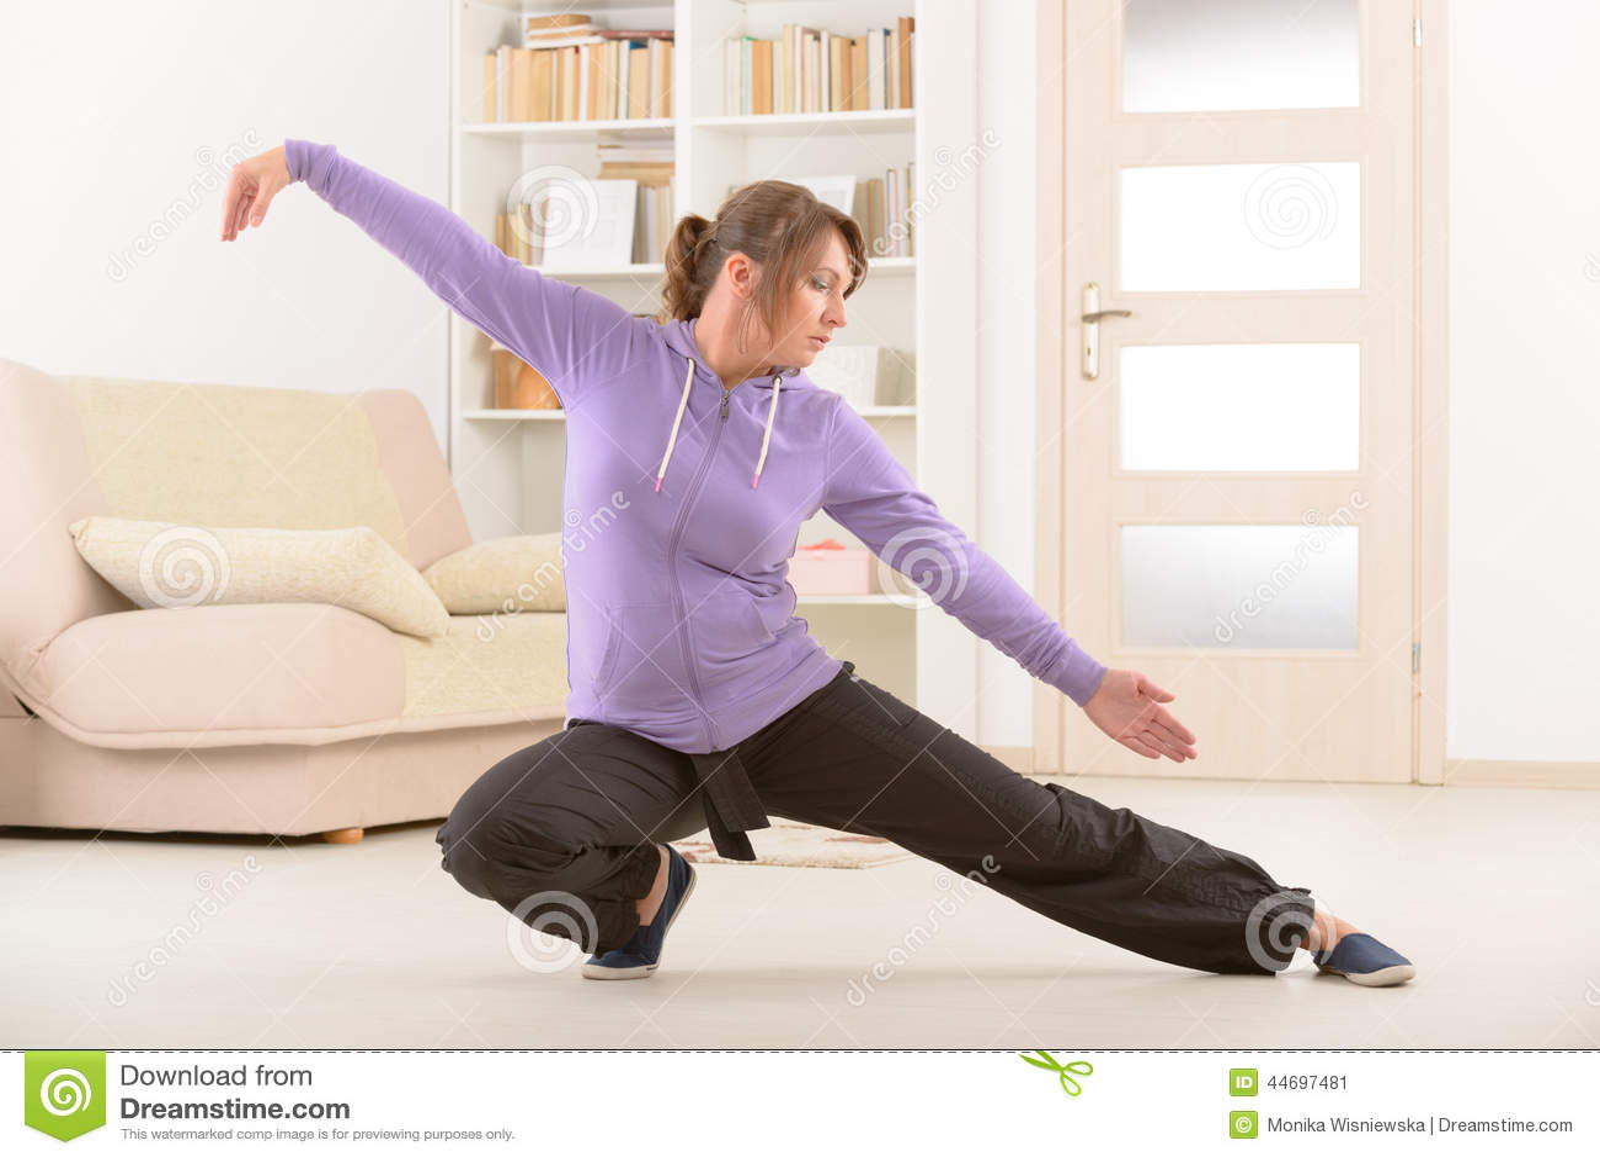 Woman Doing Qi Gong Tai Chi Exercise Stock Photo - Image: 44697481